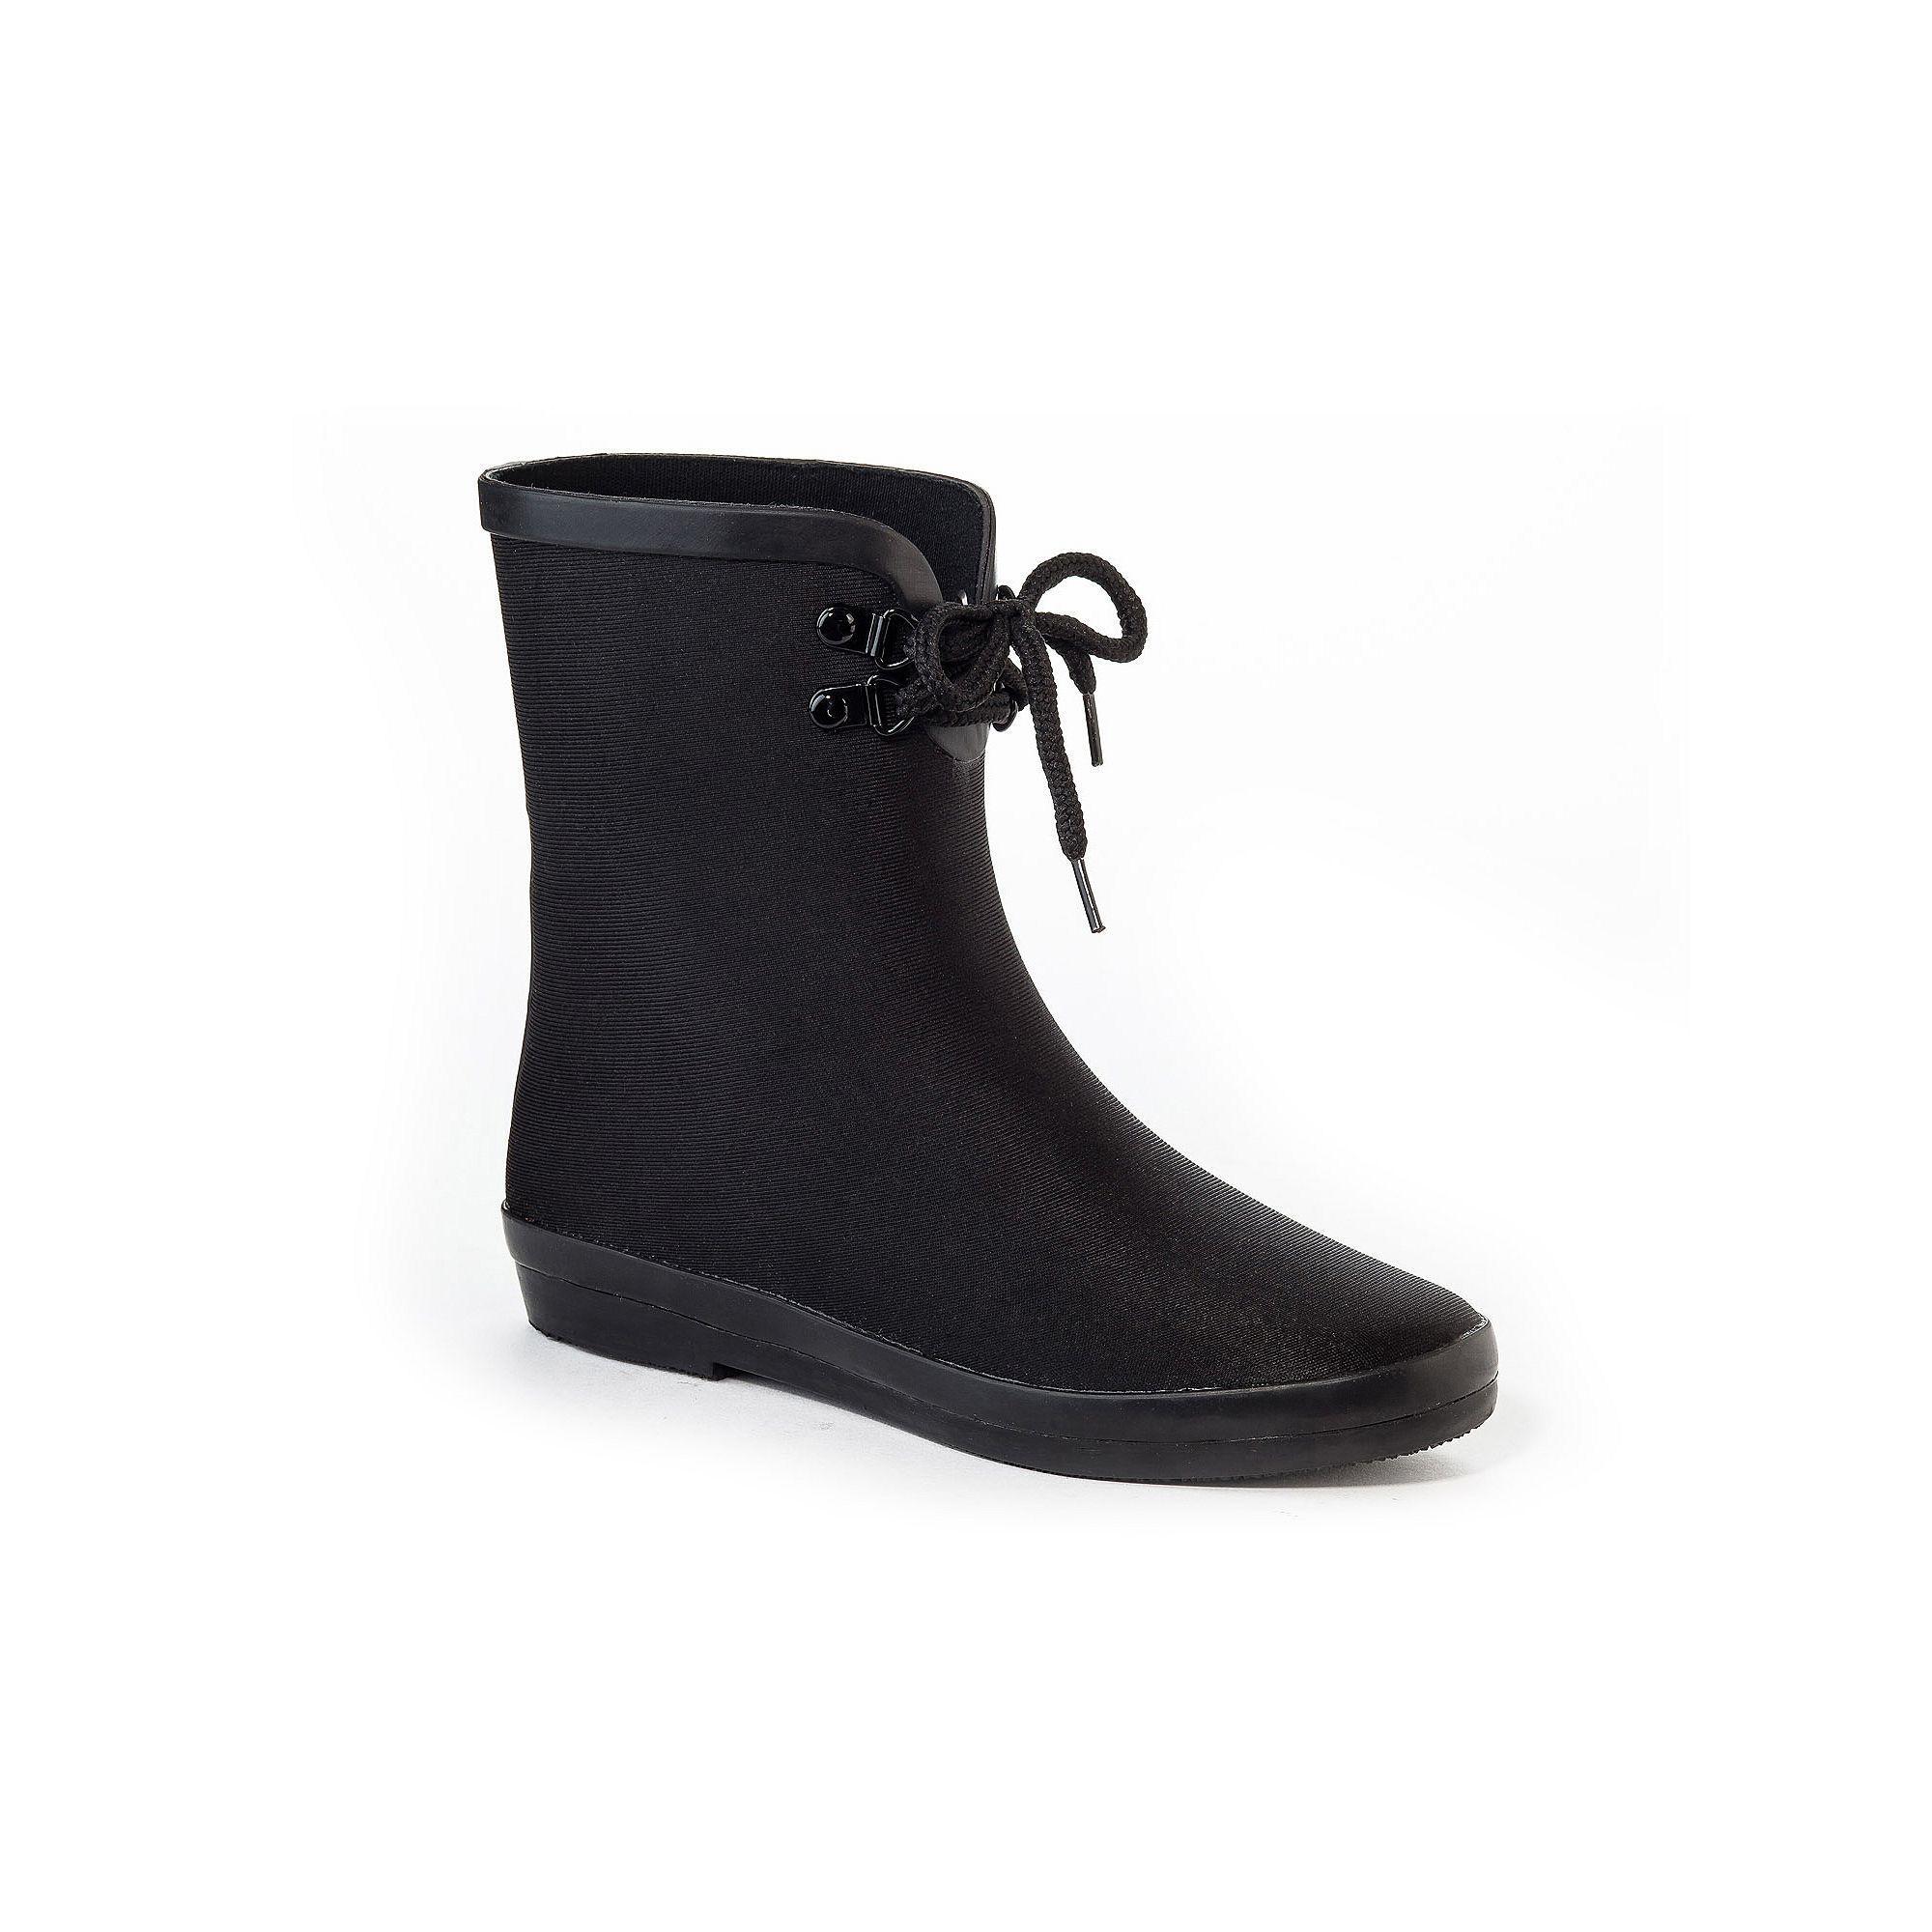 Henry Ferrera Blooming Women's Water-Resistant Ankle Rain Boots, Size: 10,  Black